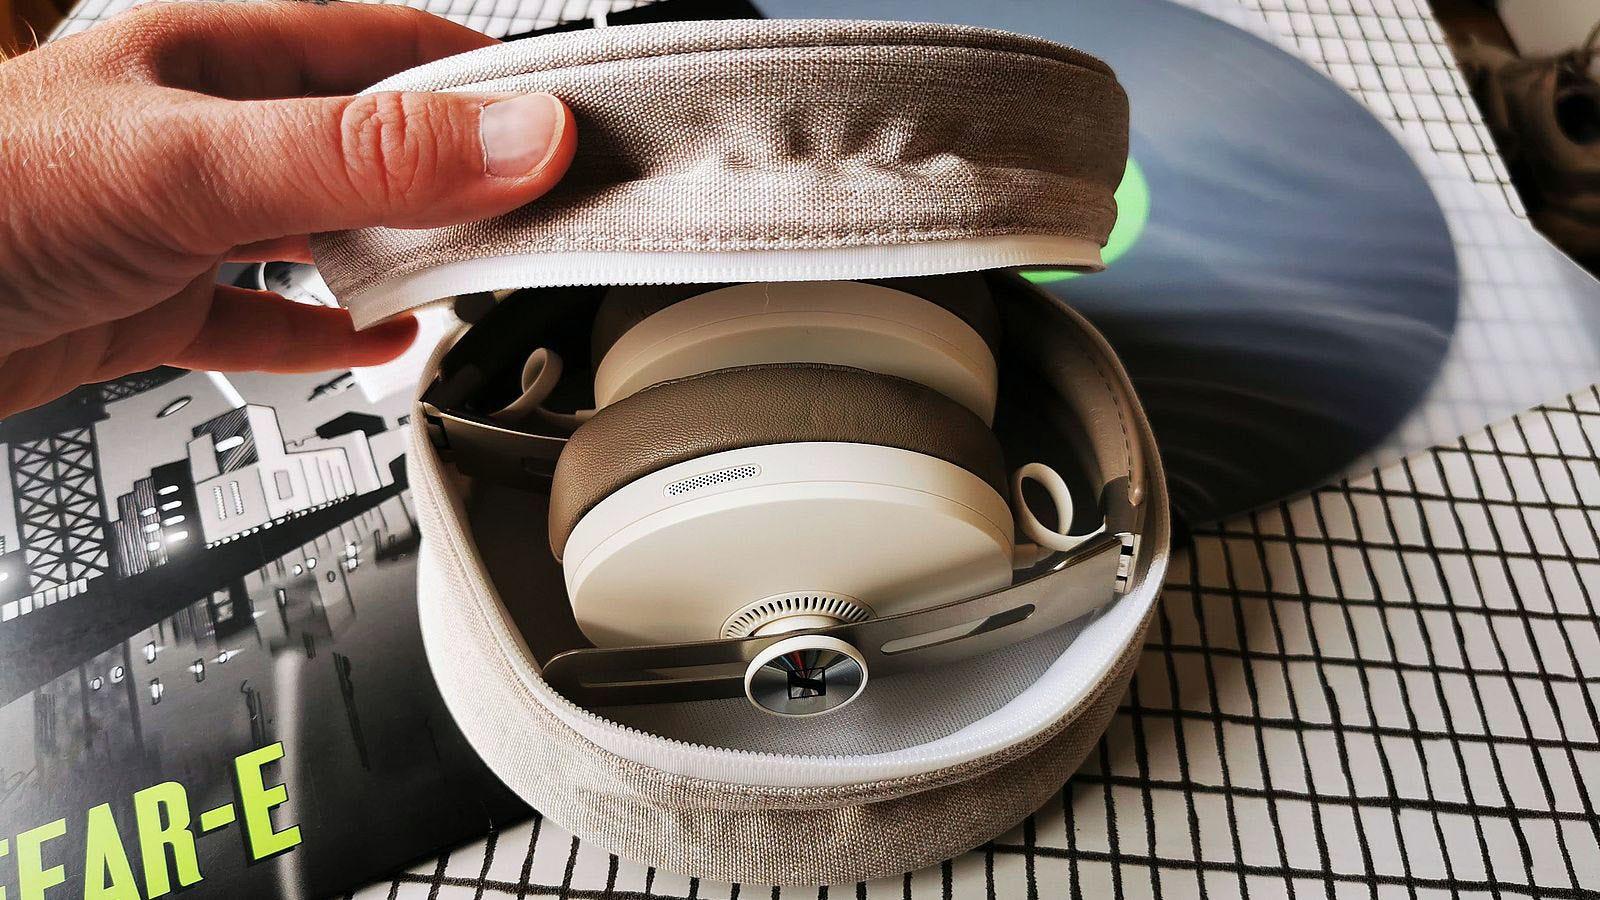 momentum 3 headphones folded in case